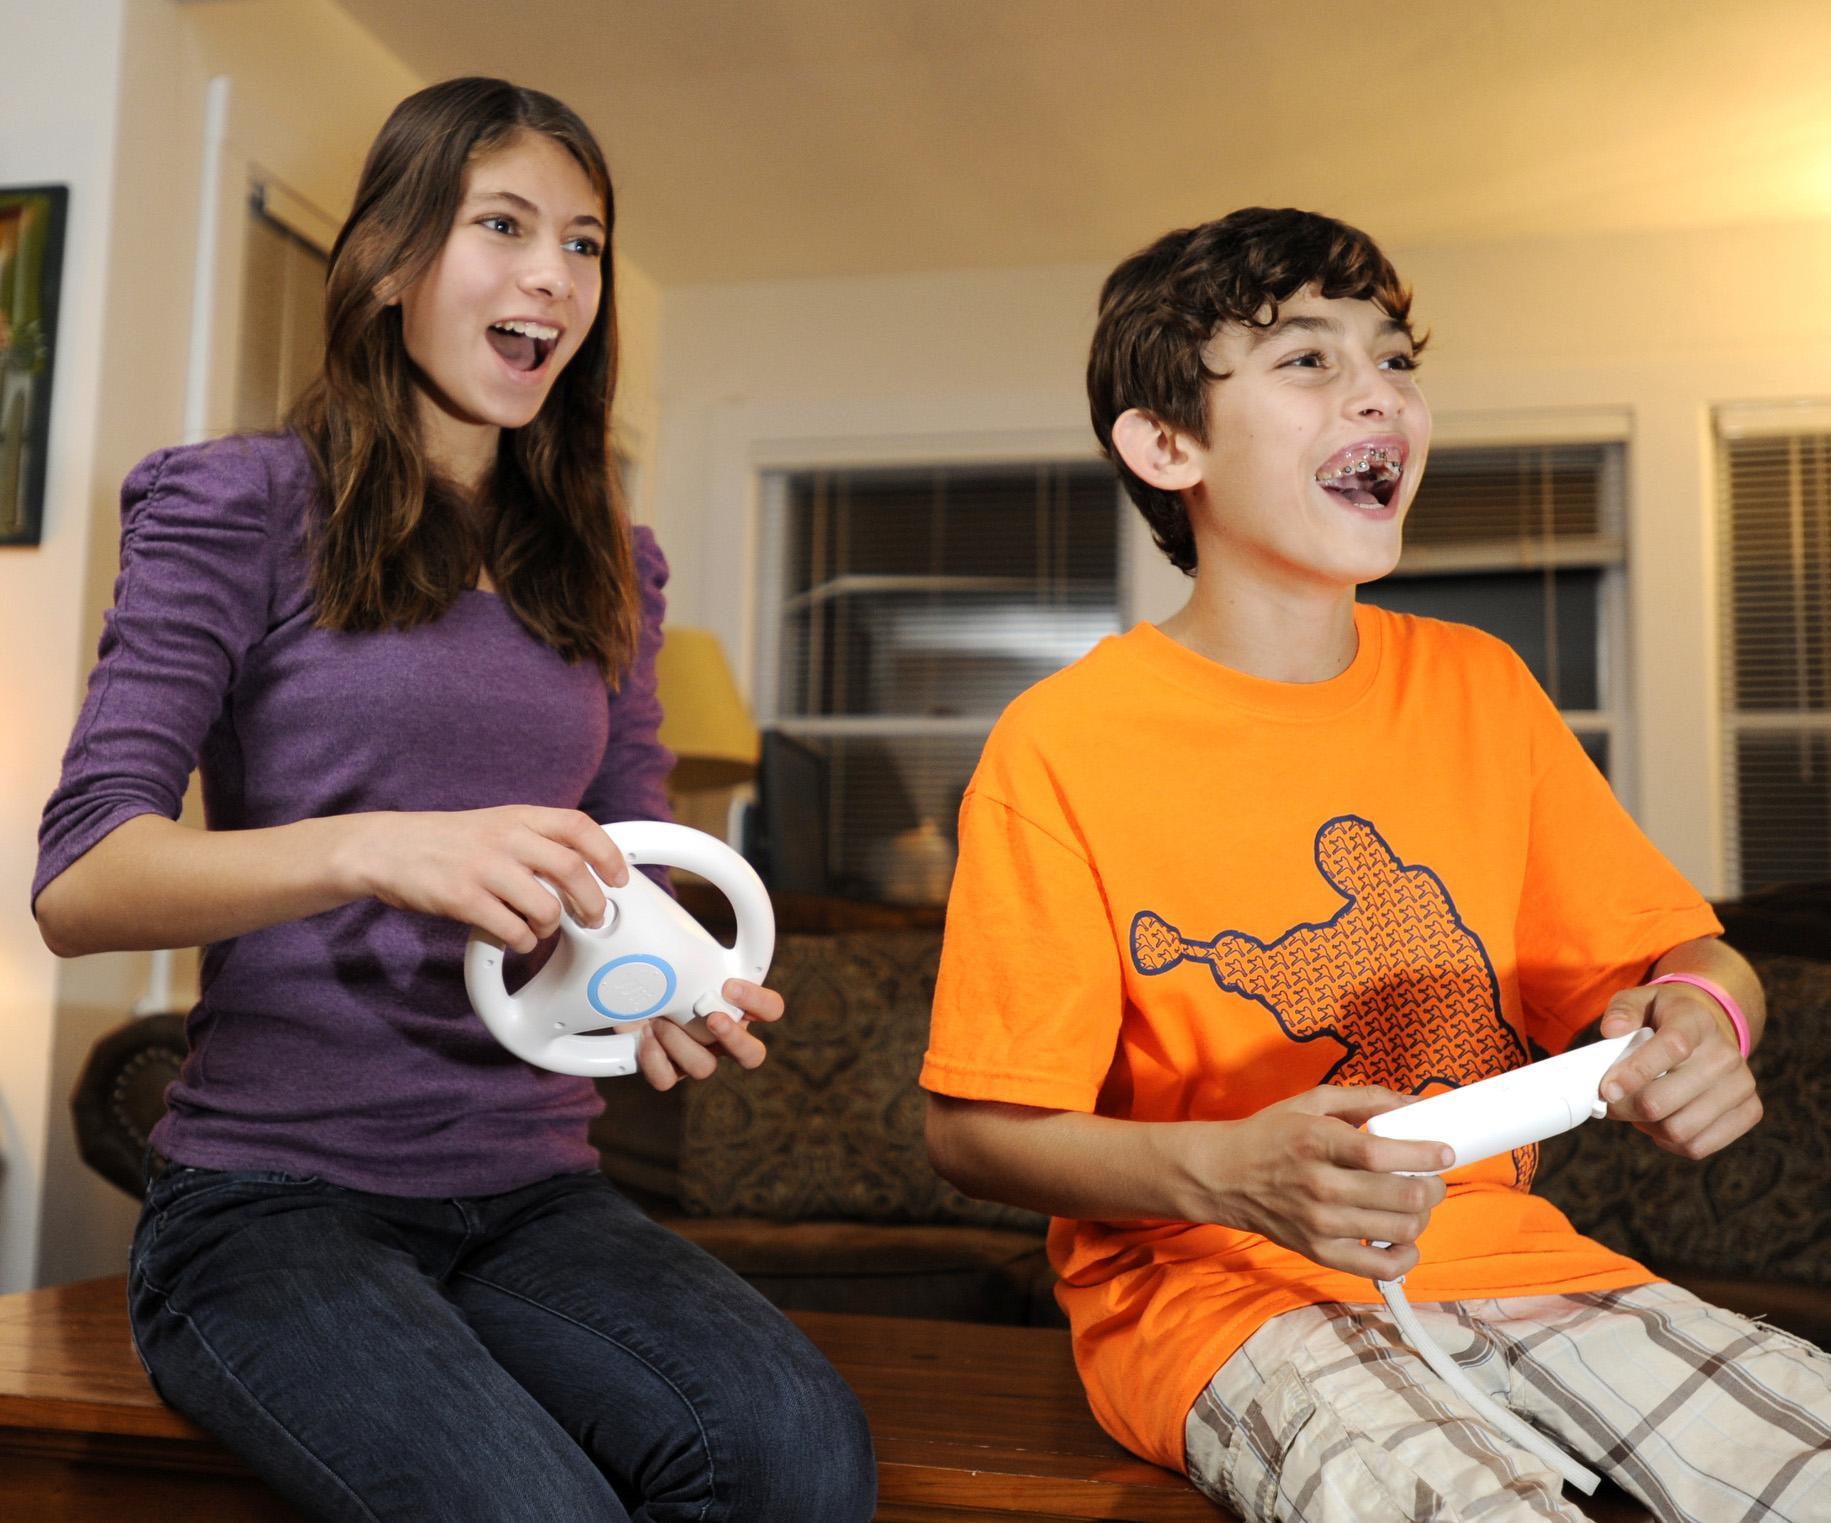 joy family friendly gaming - HD1831×1523